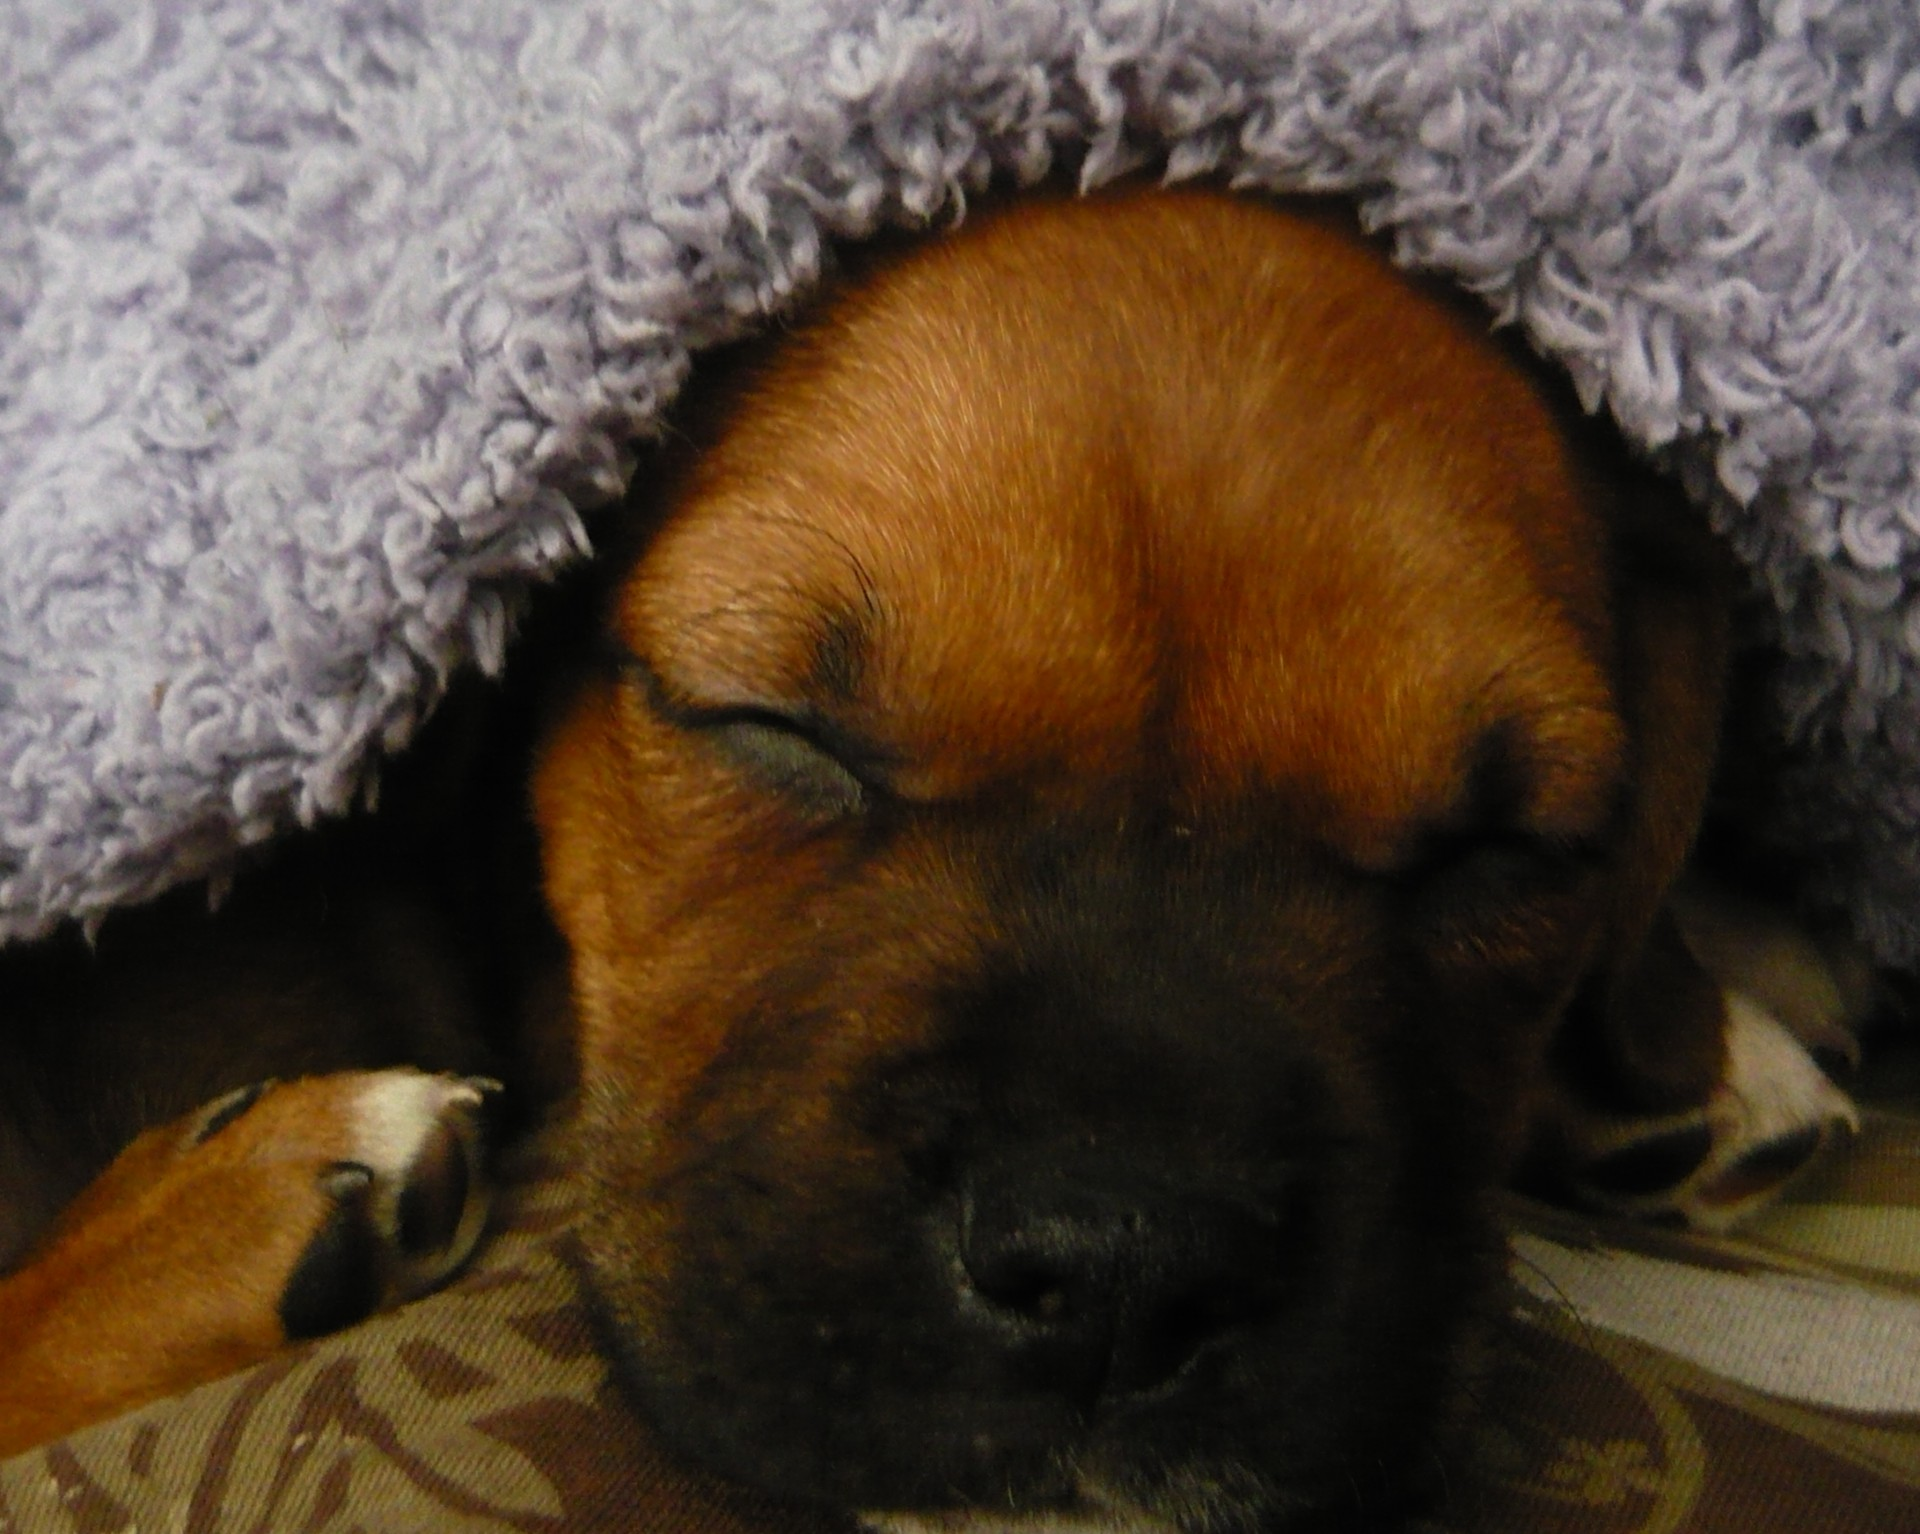 Sleeping Dog, Sleeping, National Sleep Comfort Month, Snoozing